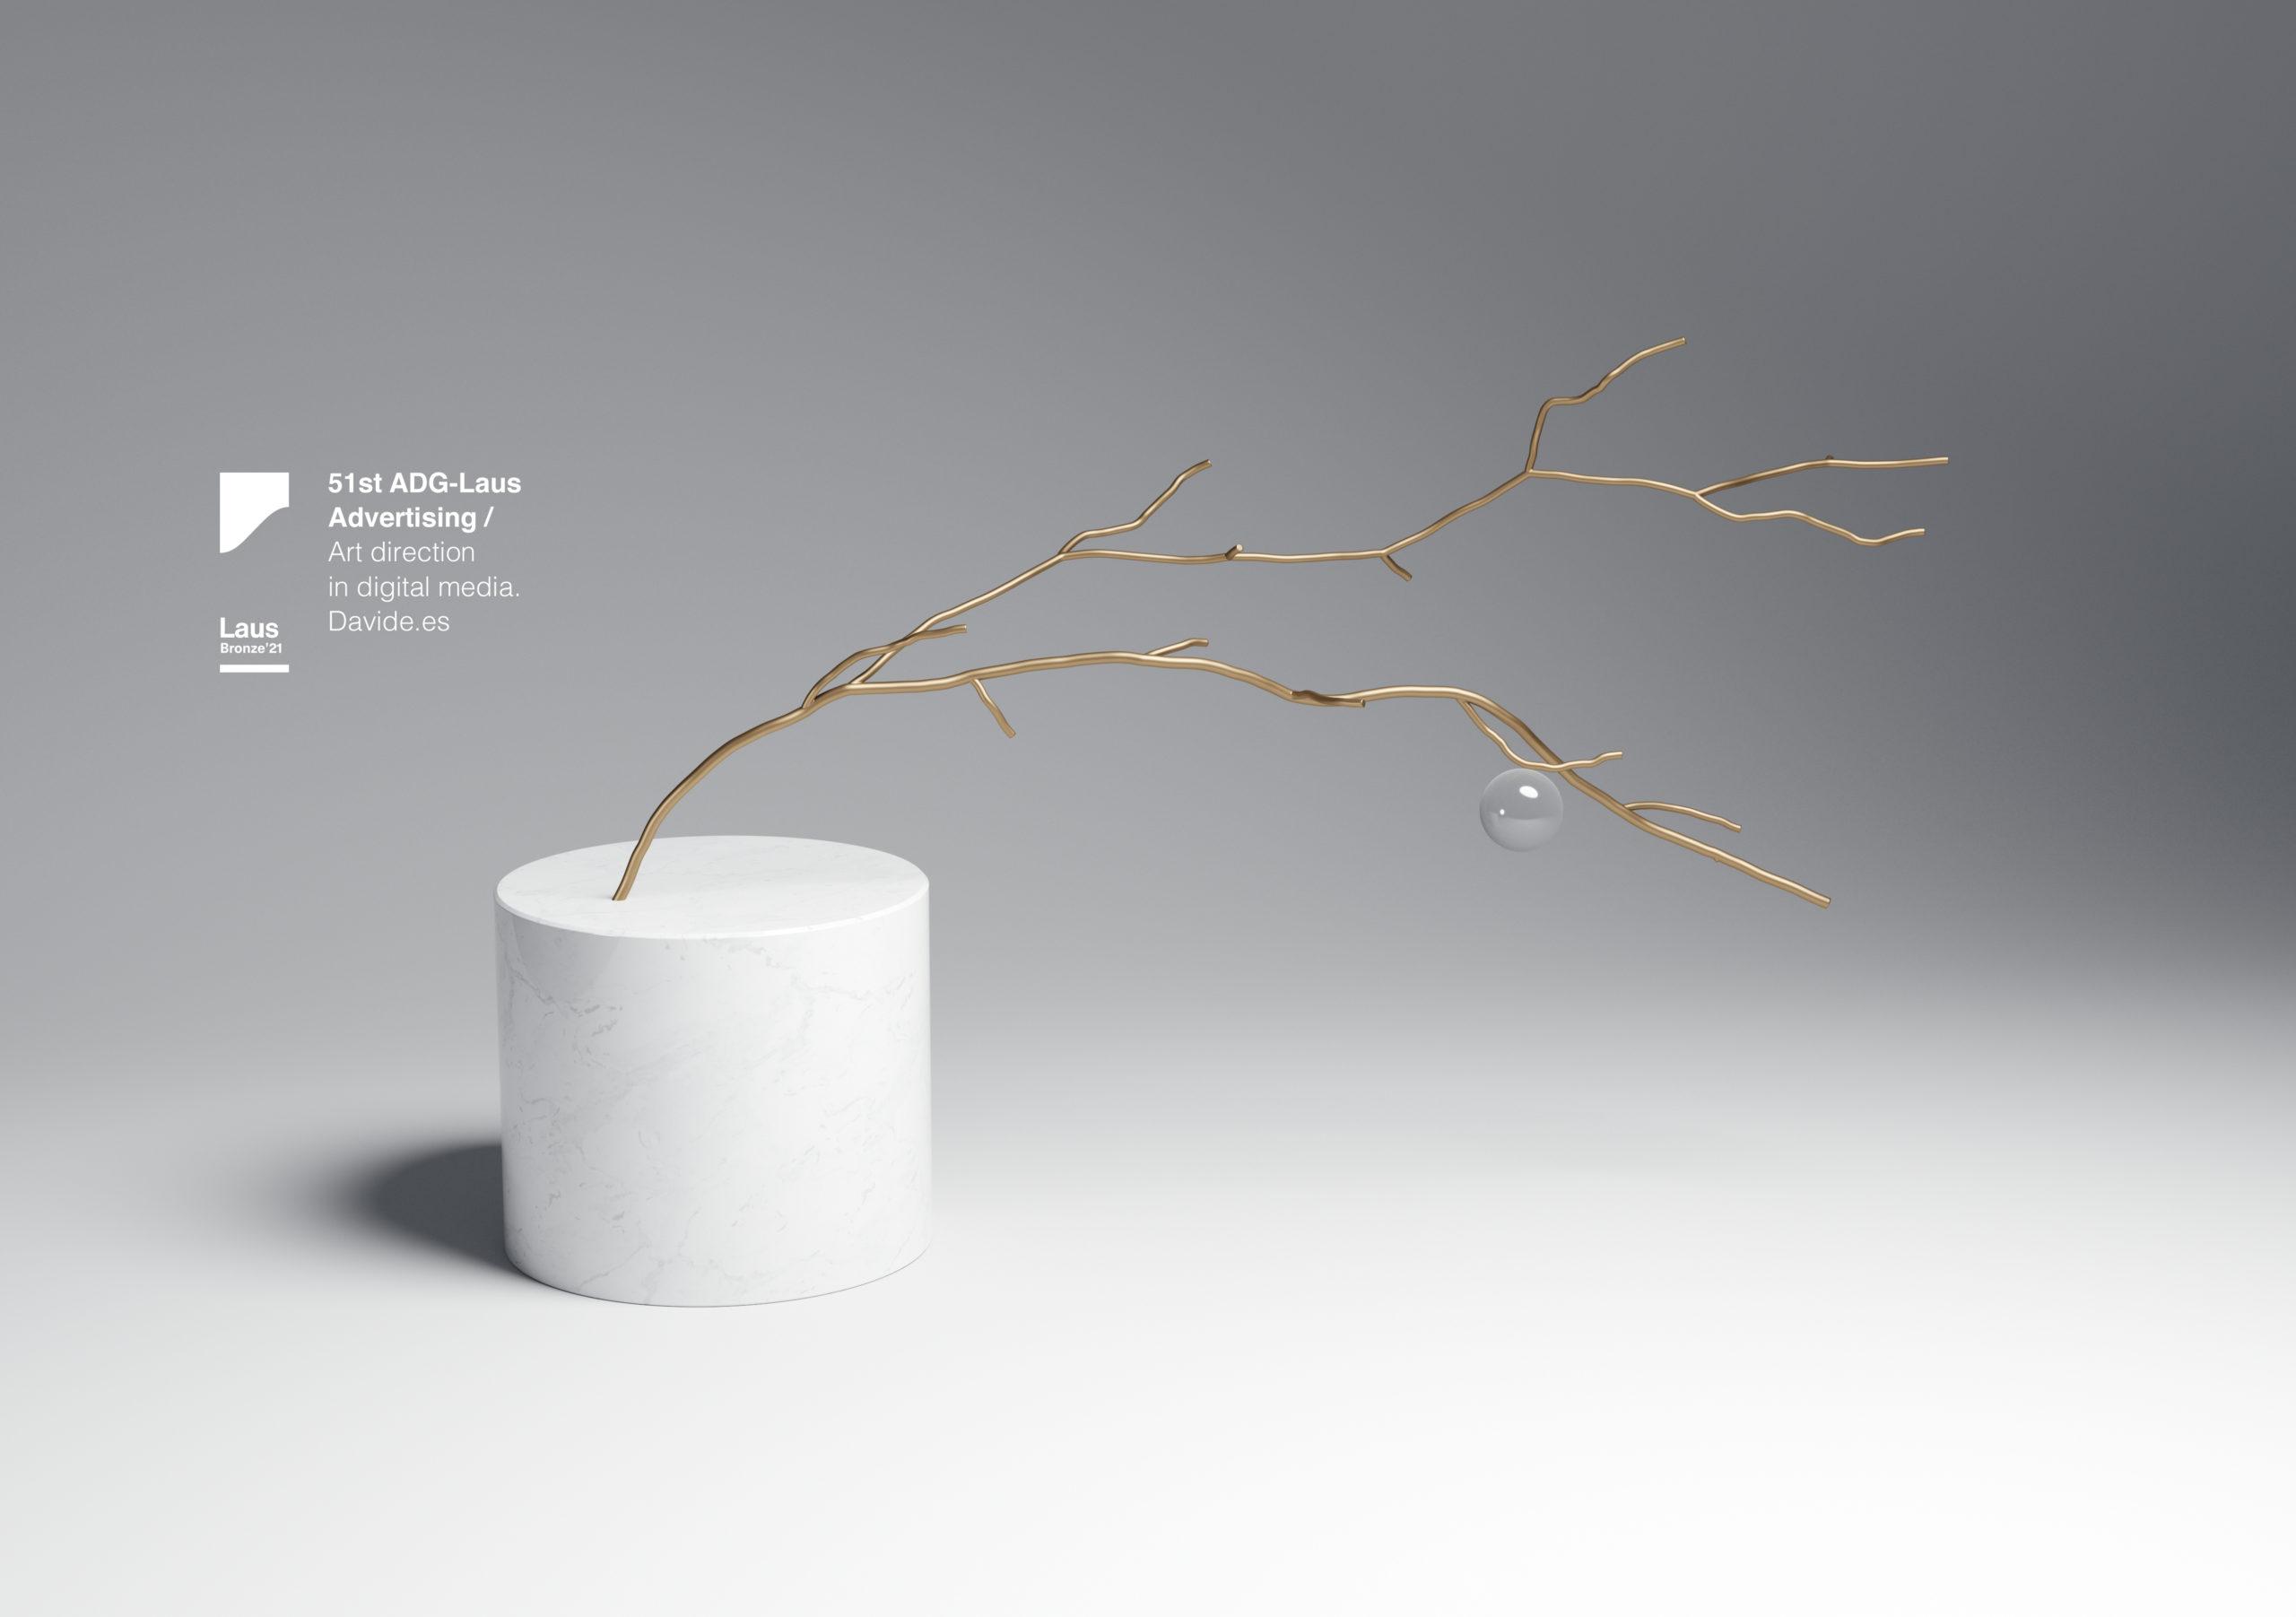 header-web-2021-davide-website-rias-baixas-albarino-roberto-nunez-studio-laus-bronze-award